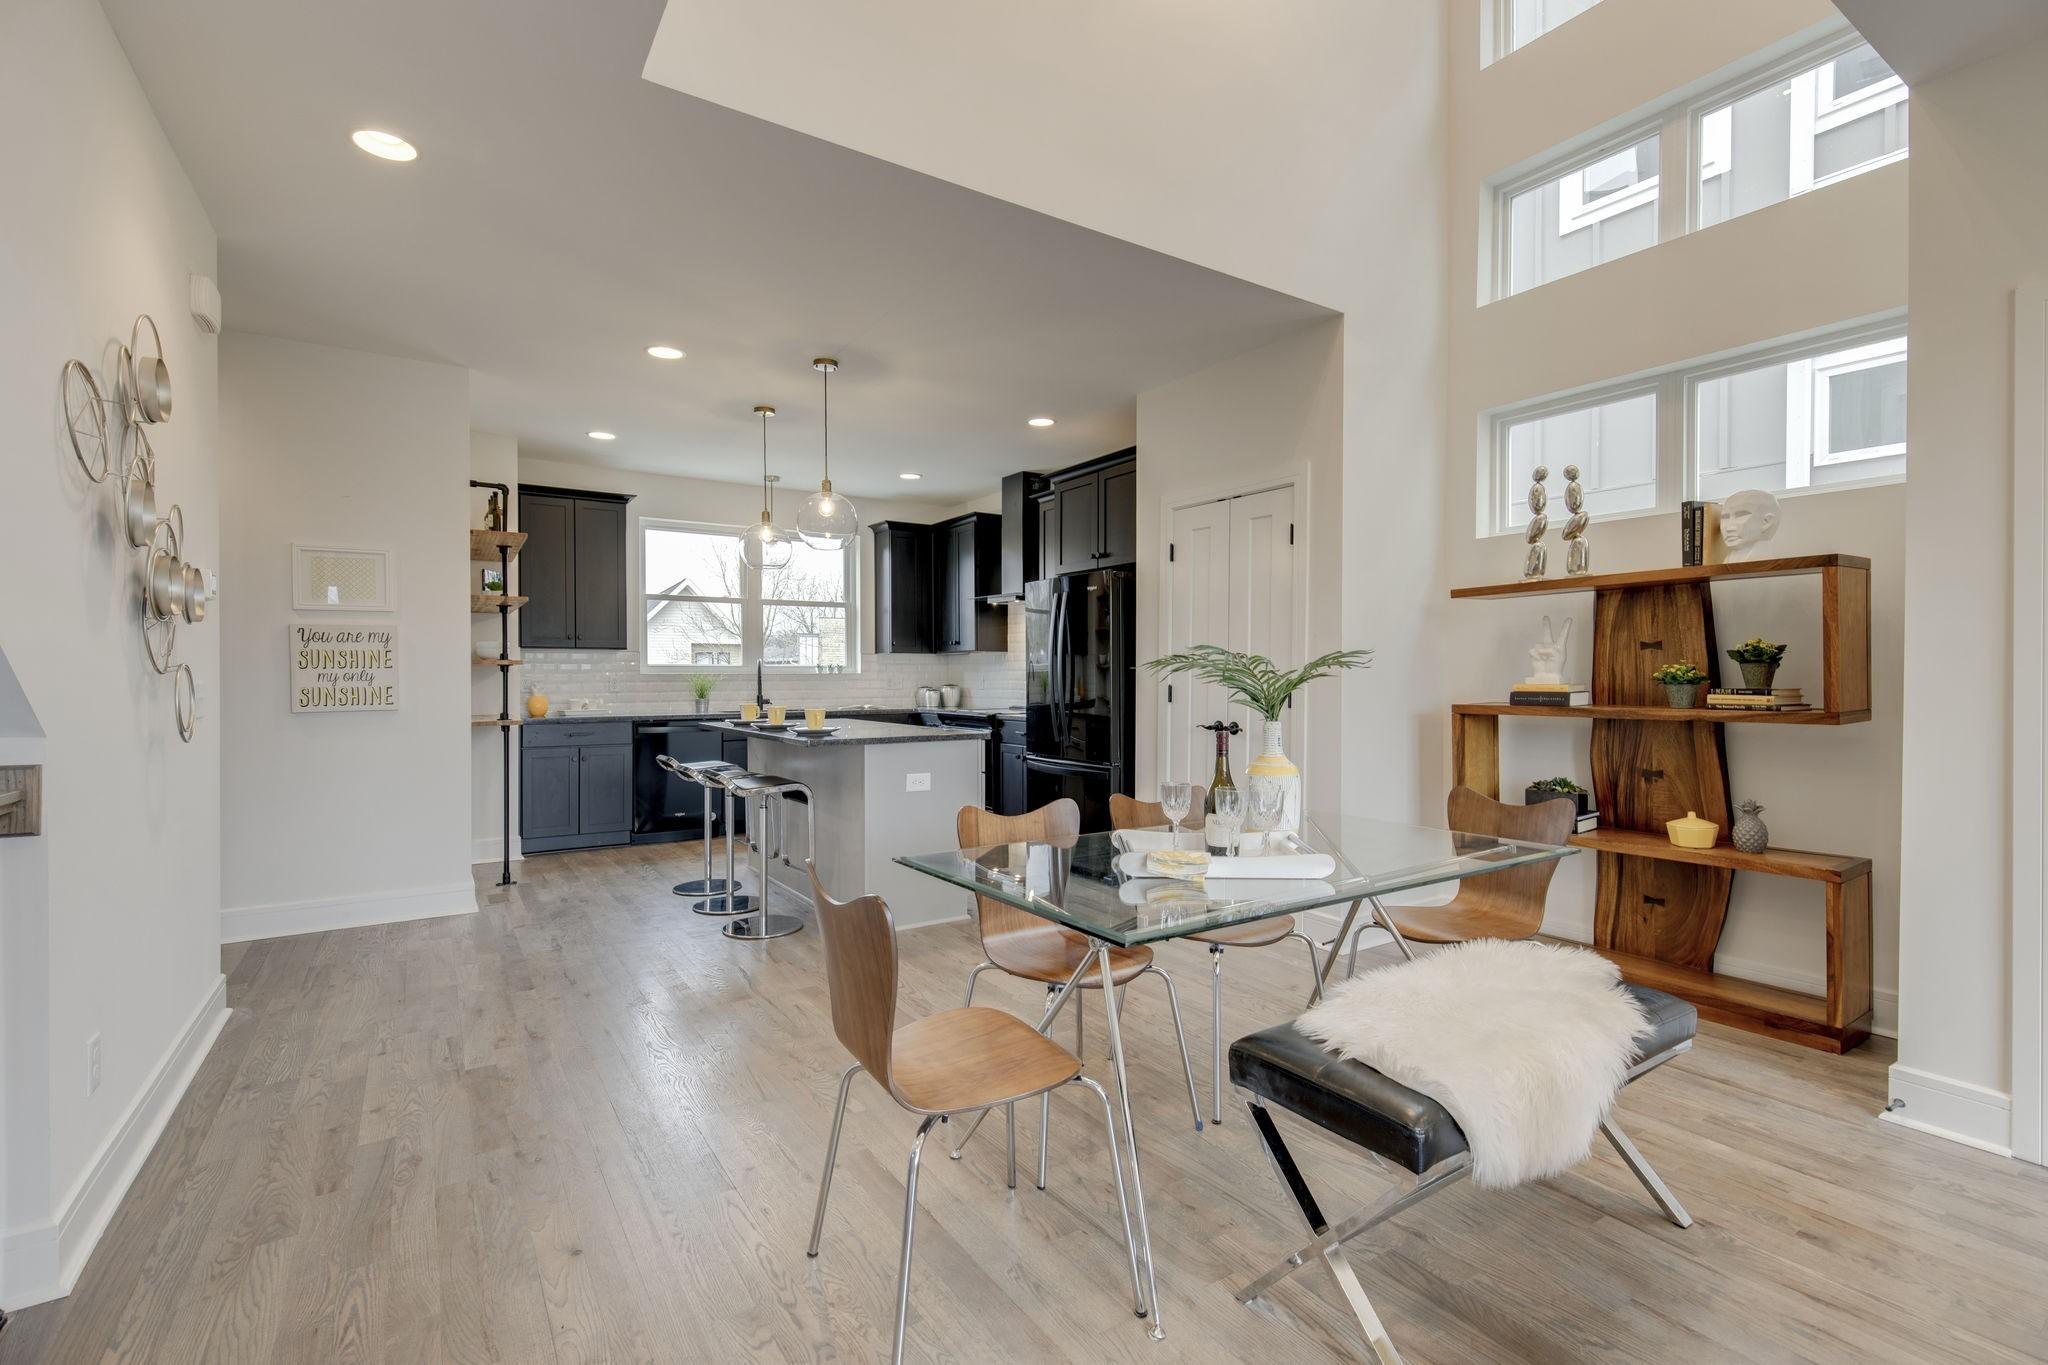 802b 28th Ave, N Property Photo